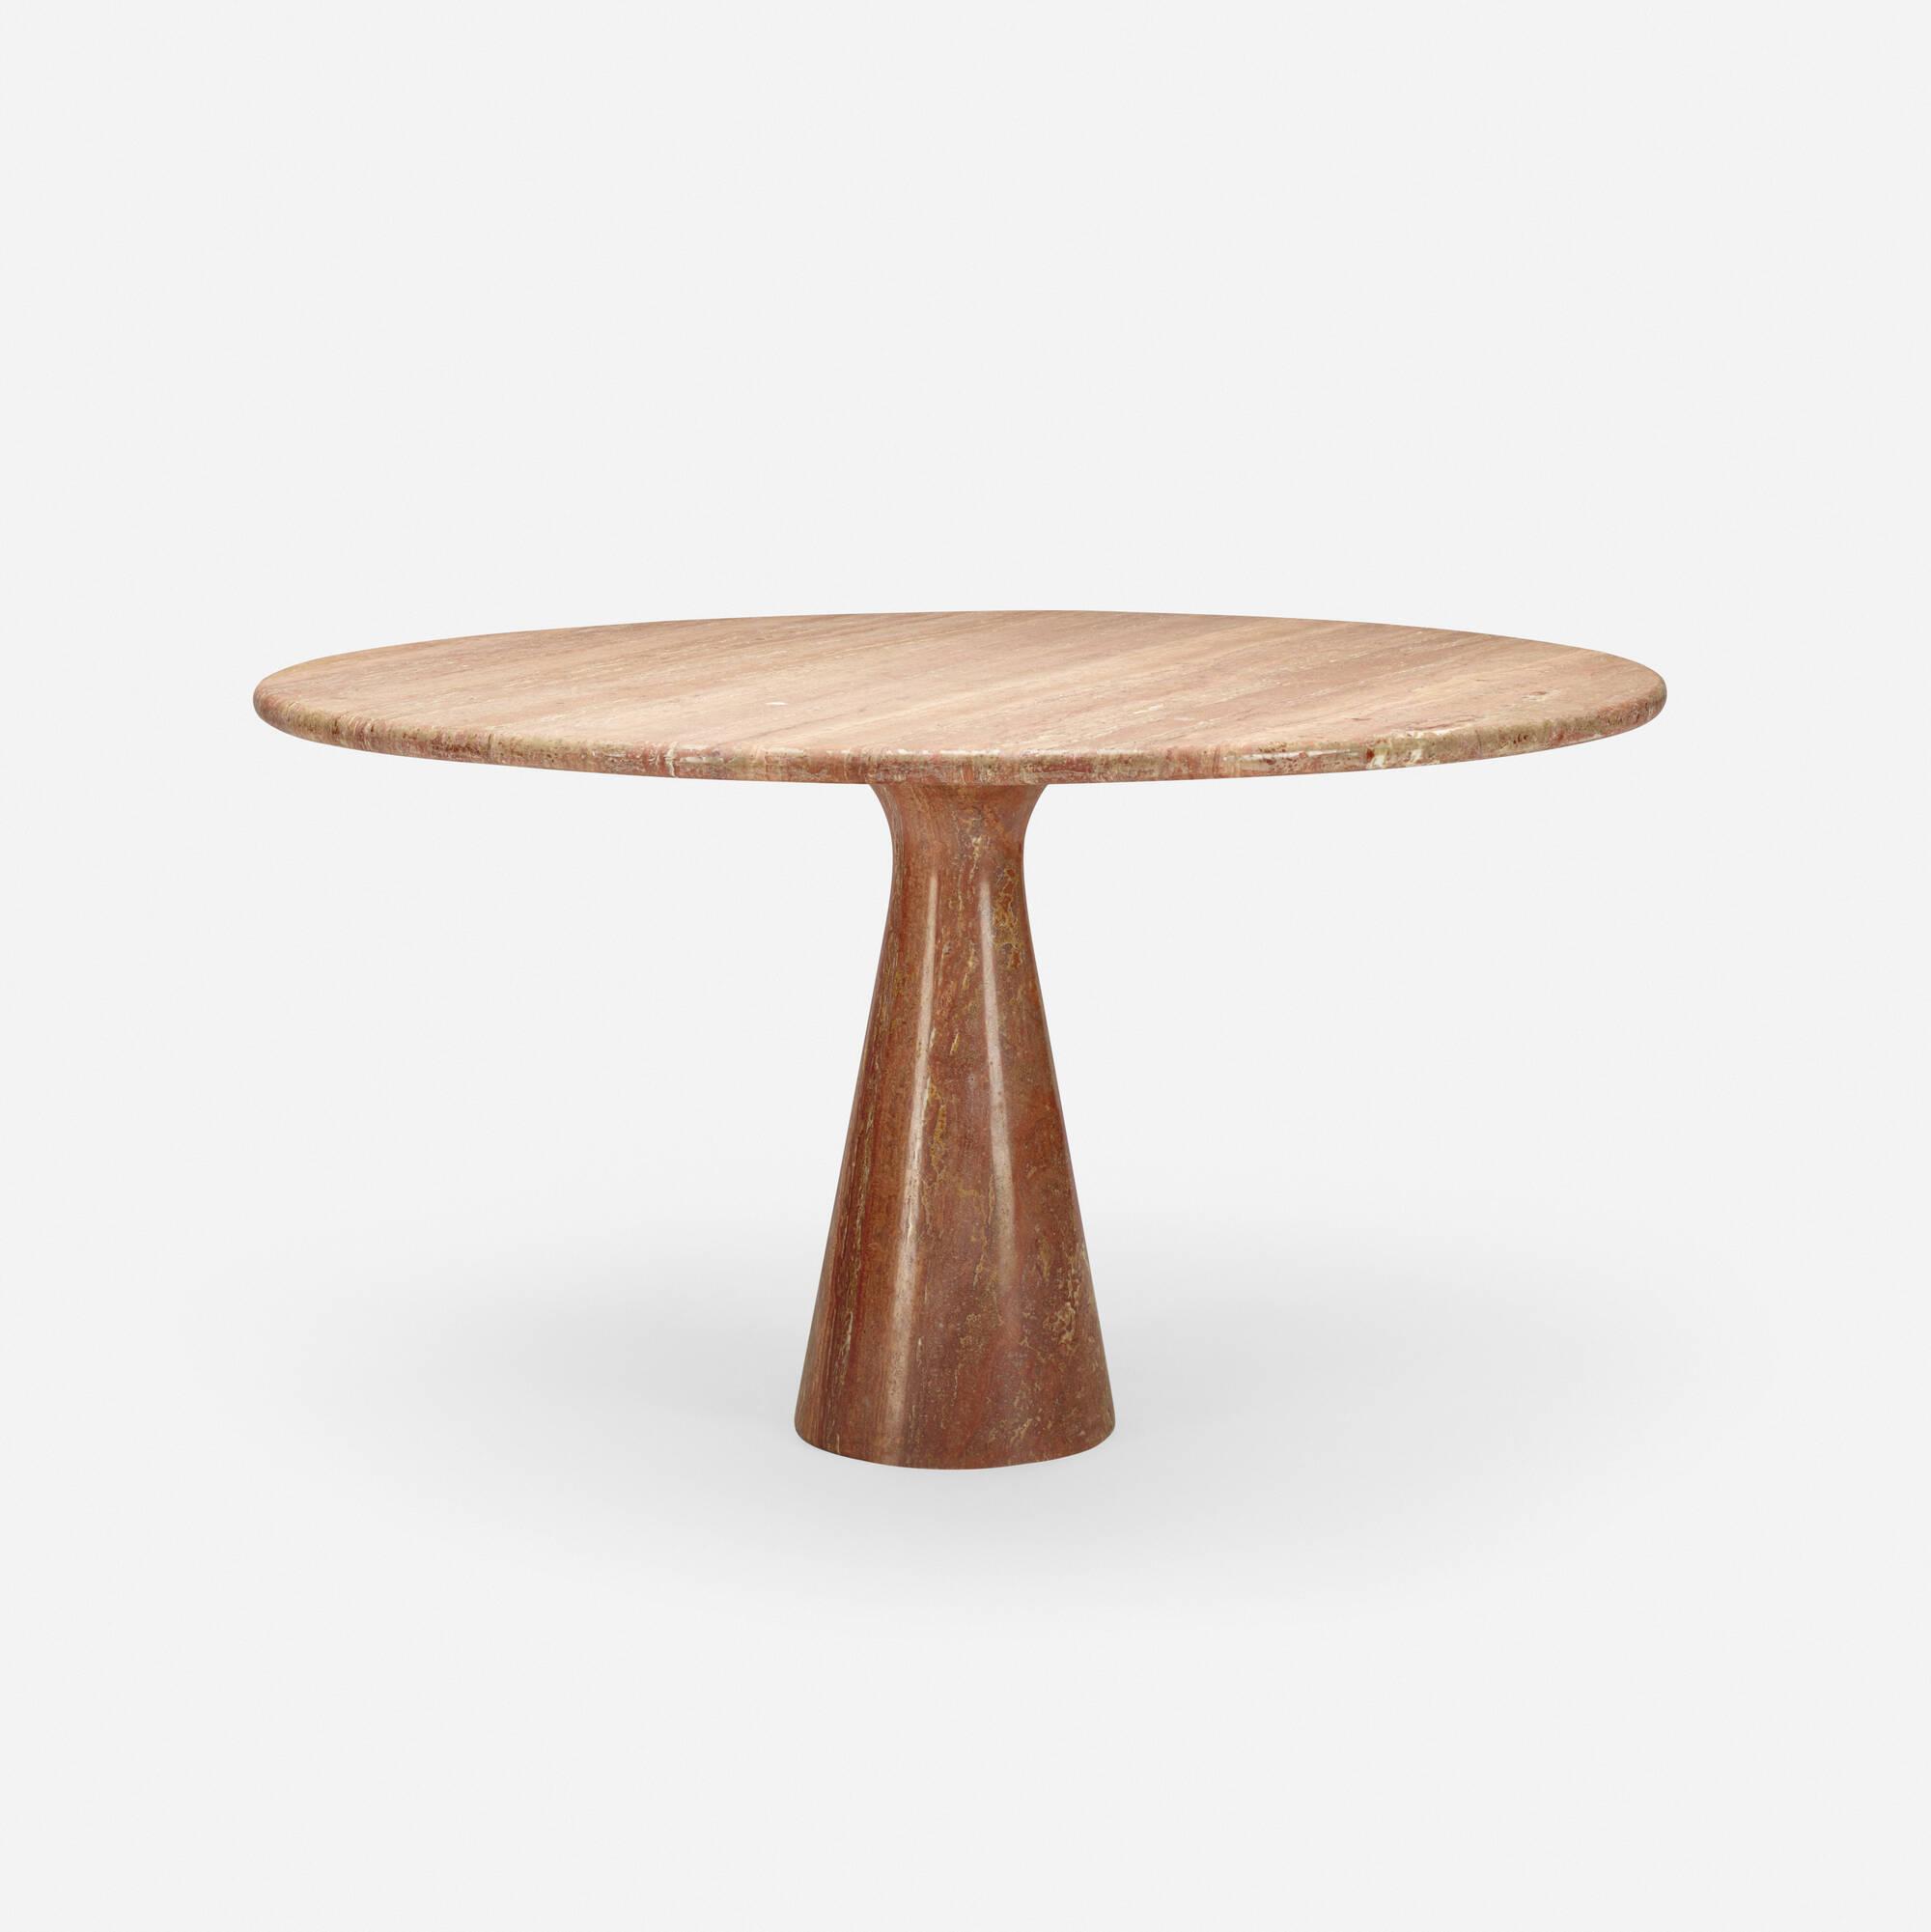 162: Angelo Mangiarotti / Table M (1 of 2)